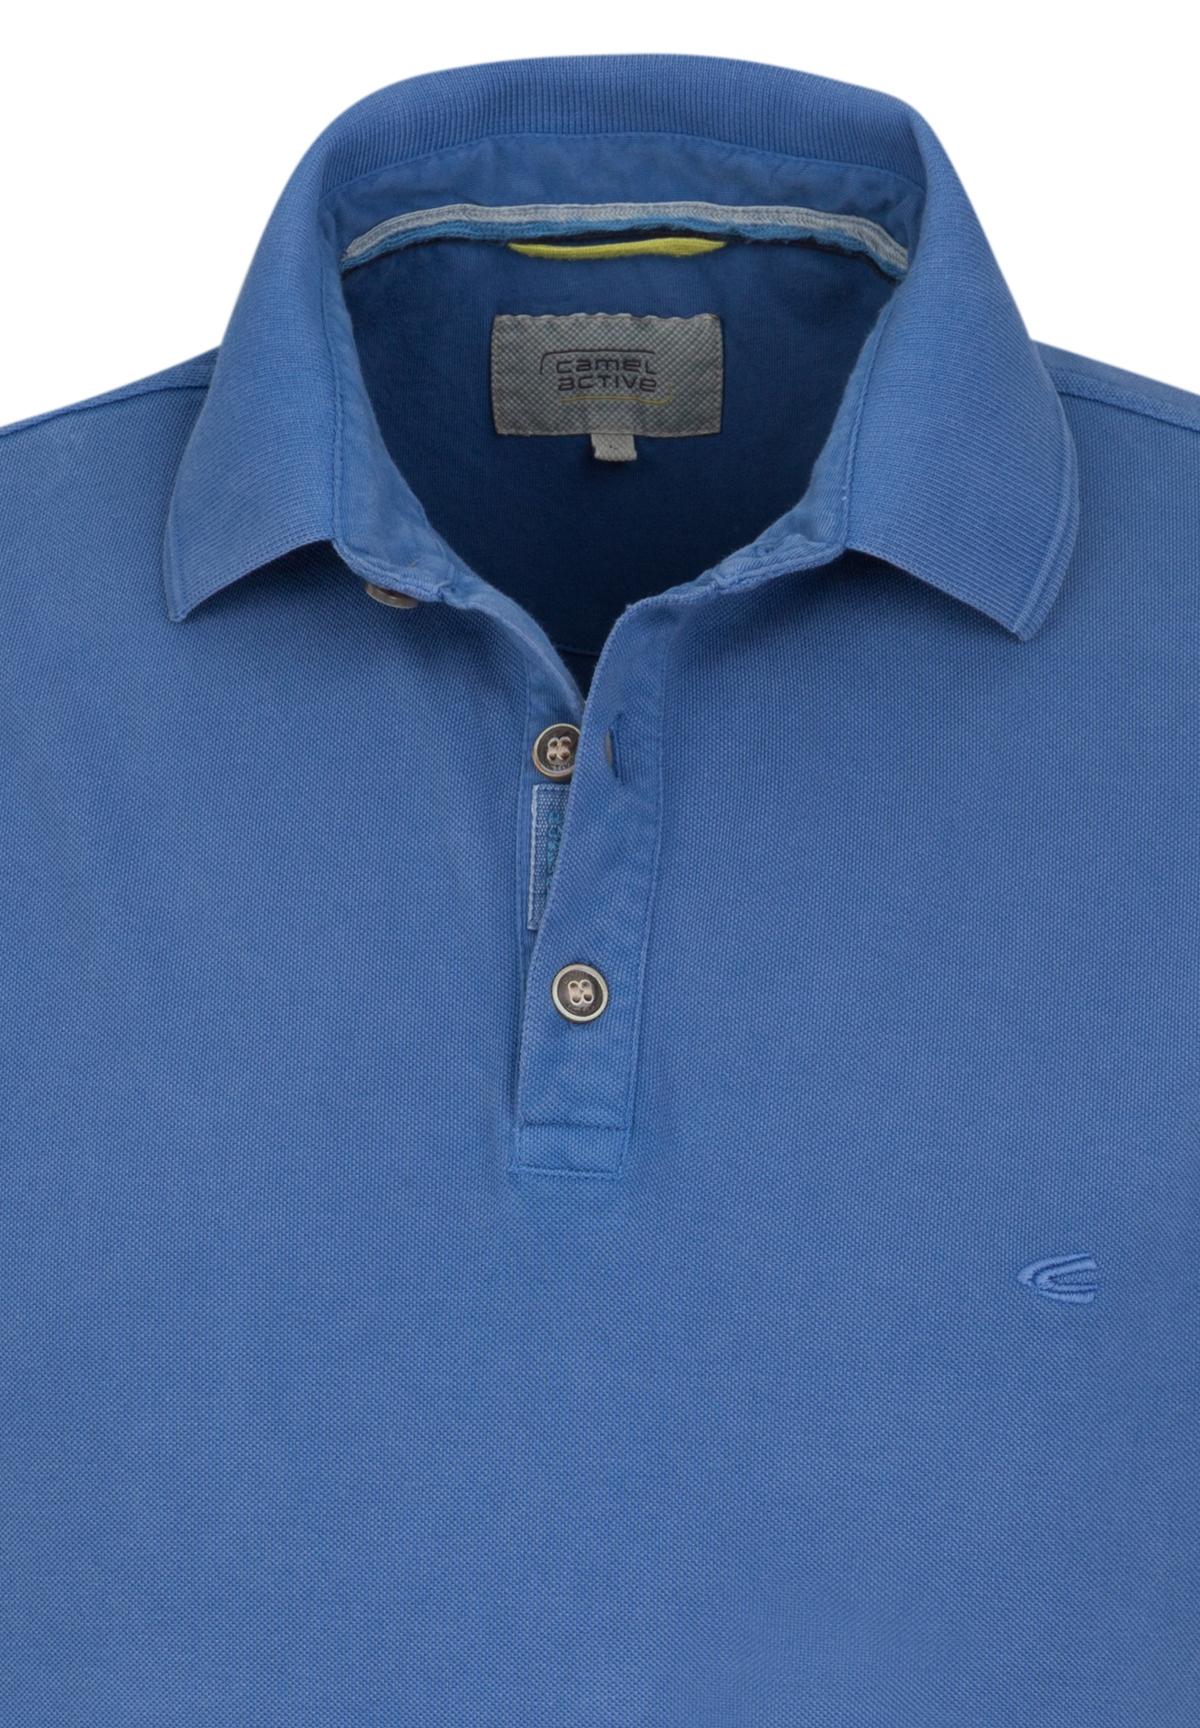 Camel-Active-Herren-Shirt-Poloshirt-Pique-Regular-Fit-NEU Indexbild 20